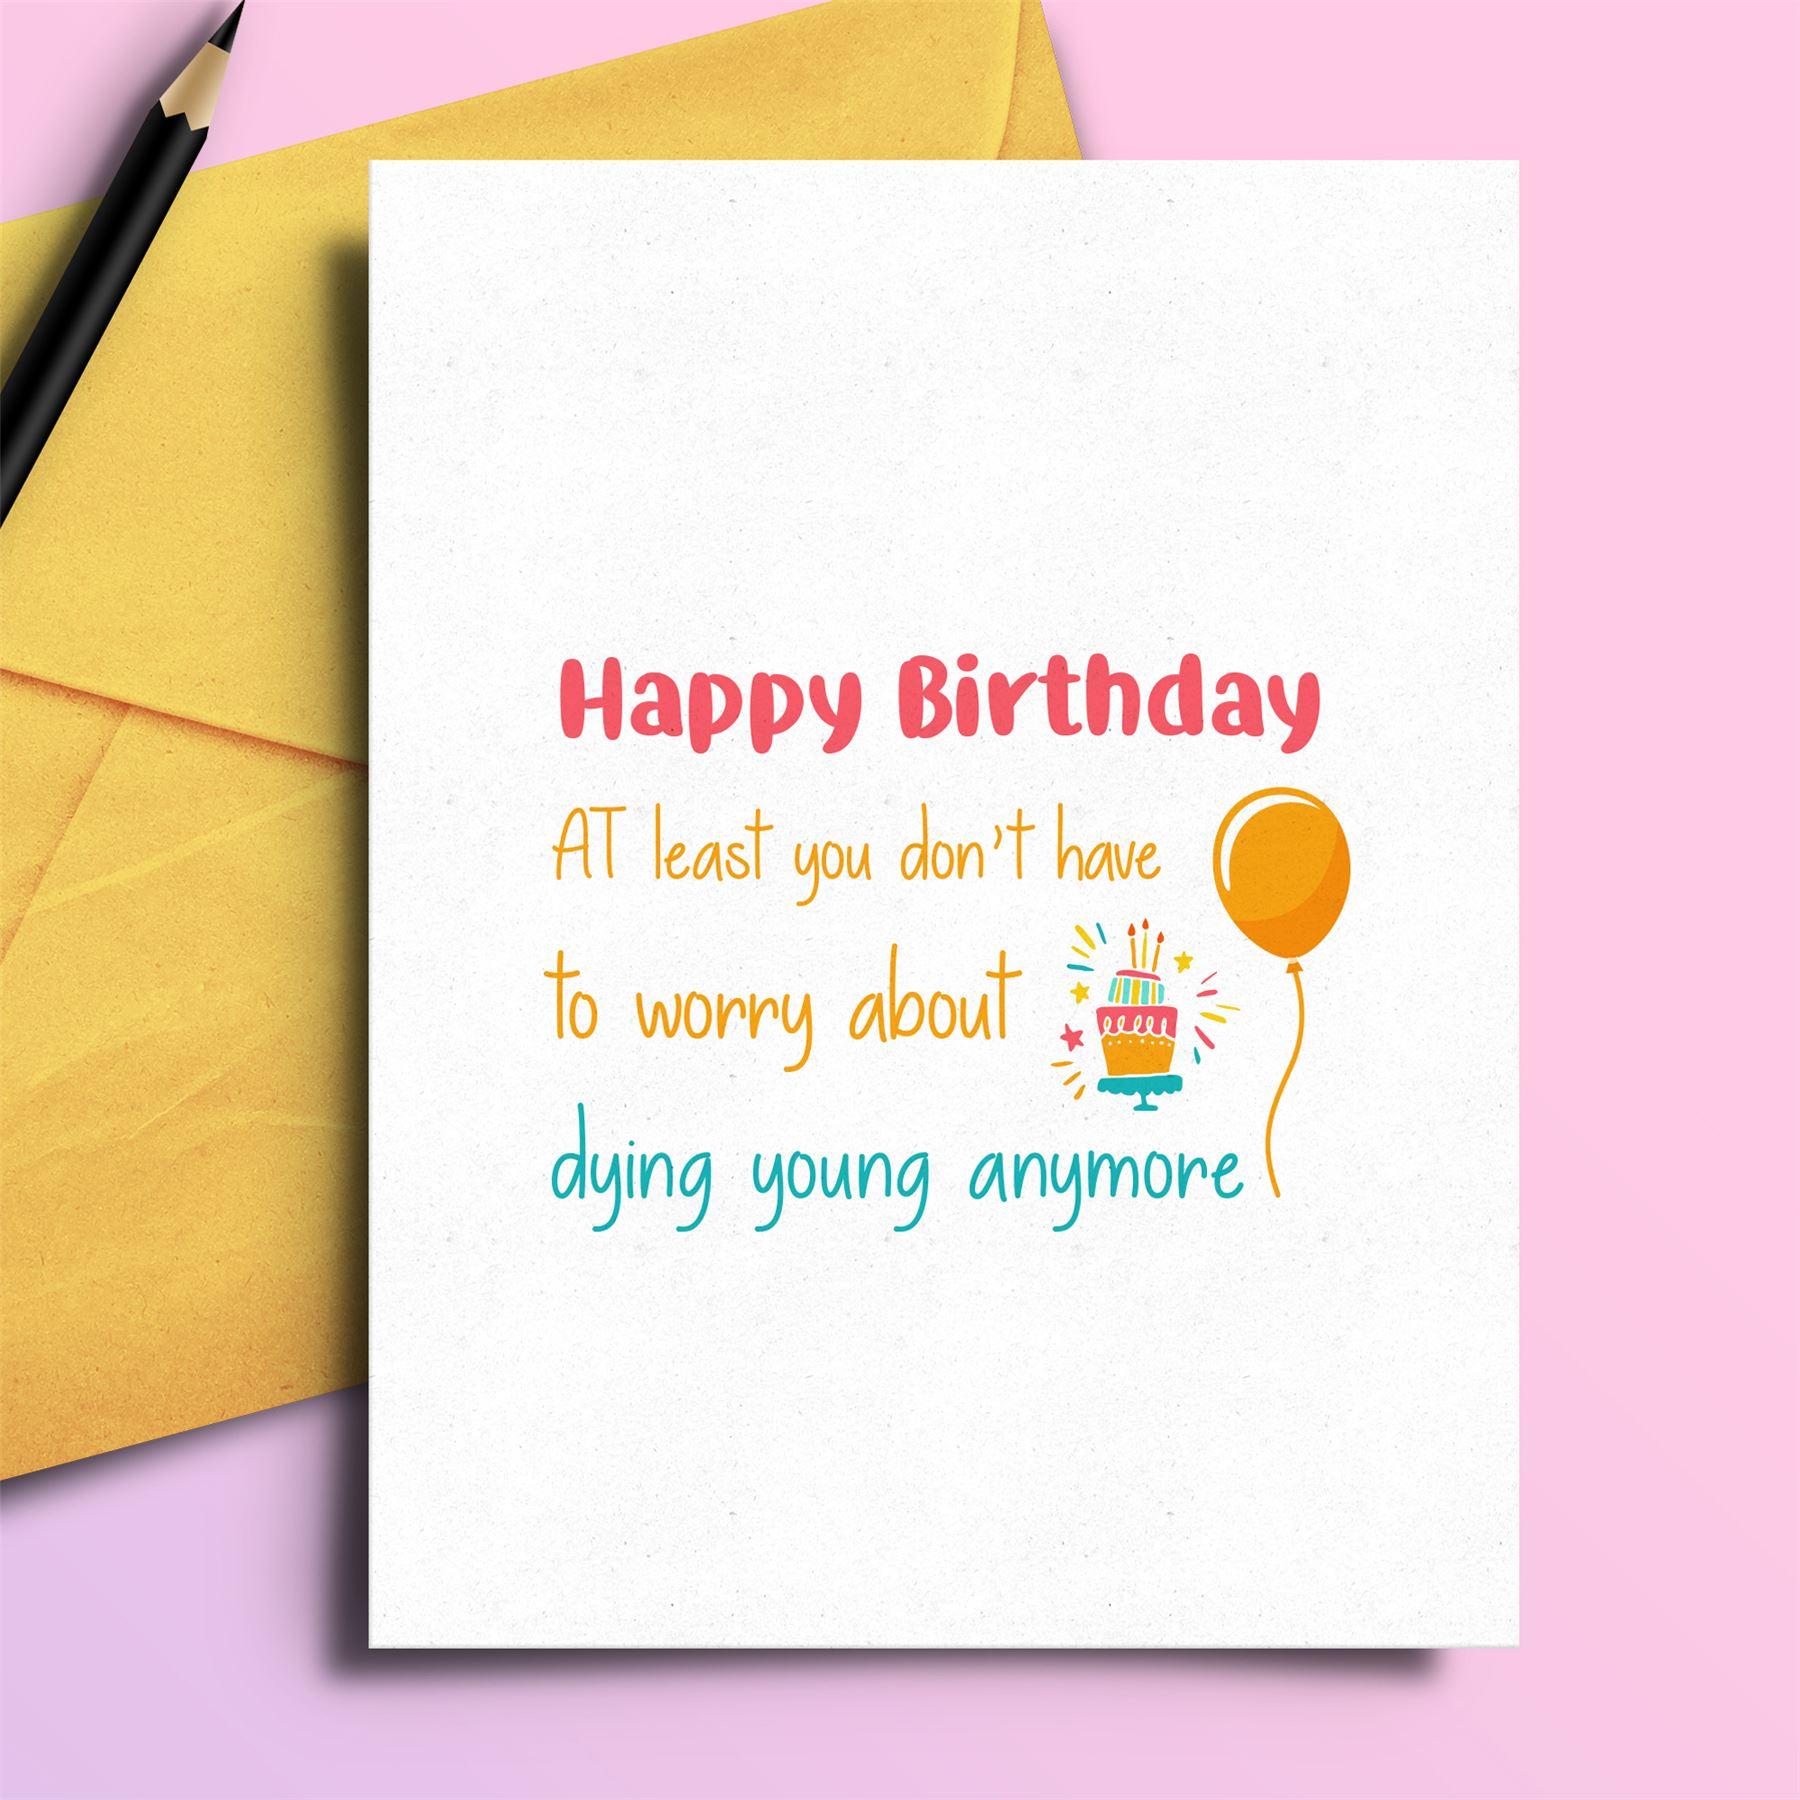 Greetings Cards Girlfriend Bestfriend Boyfriend Husband Sister Brother Dad Wife